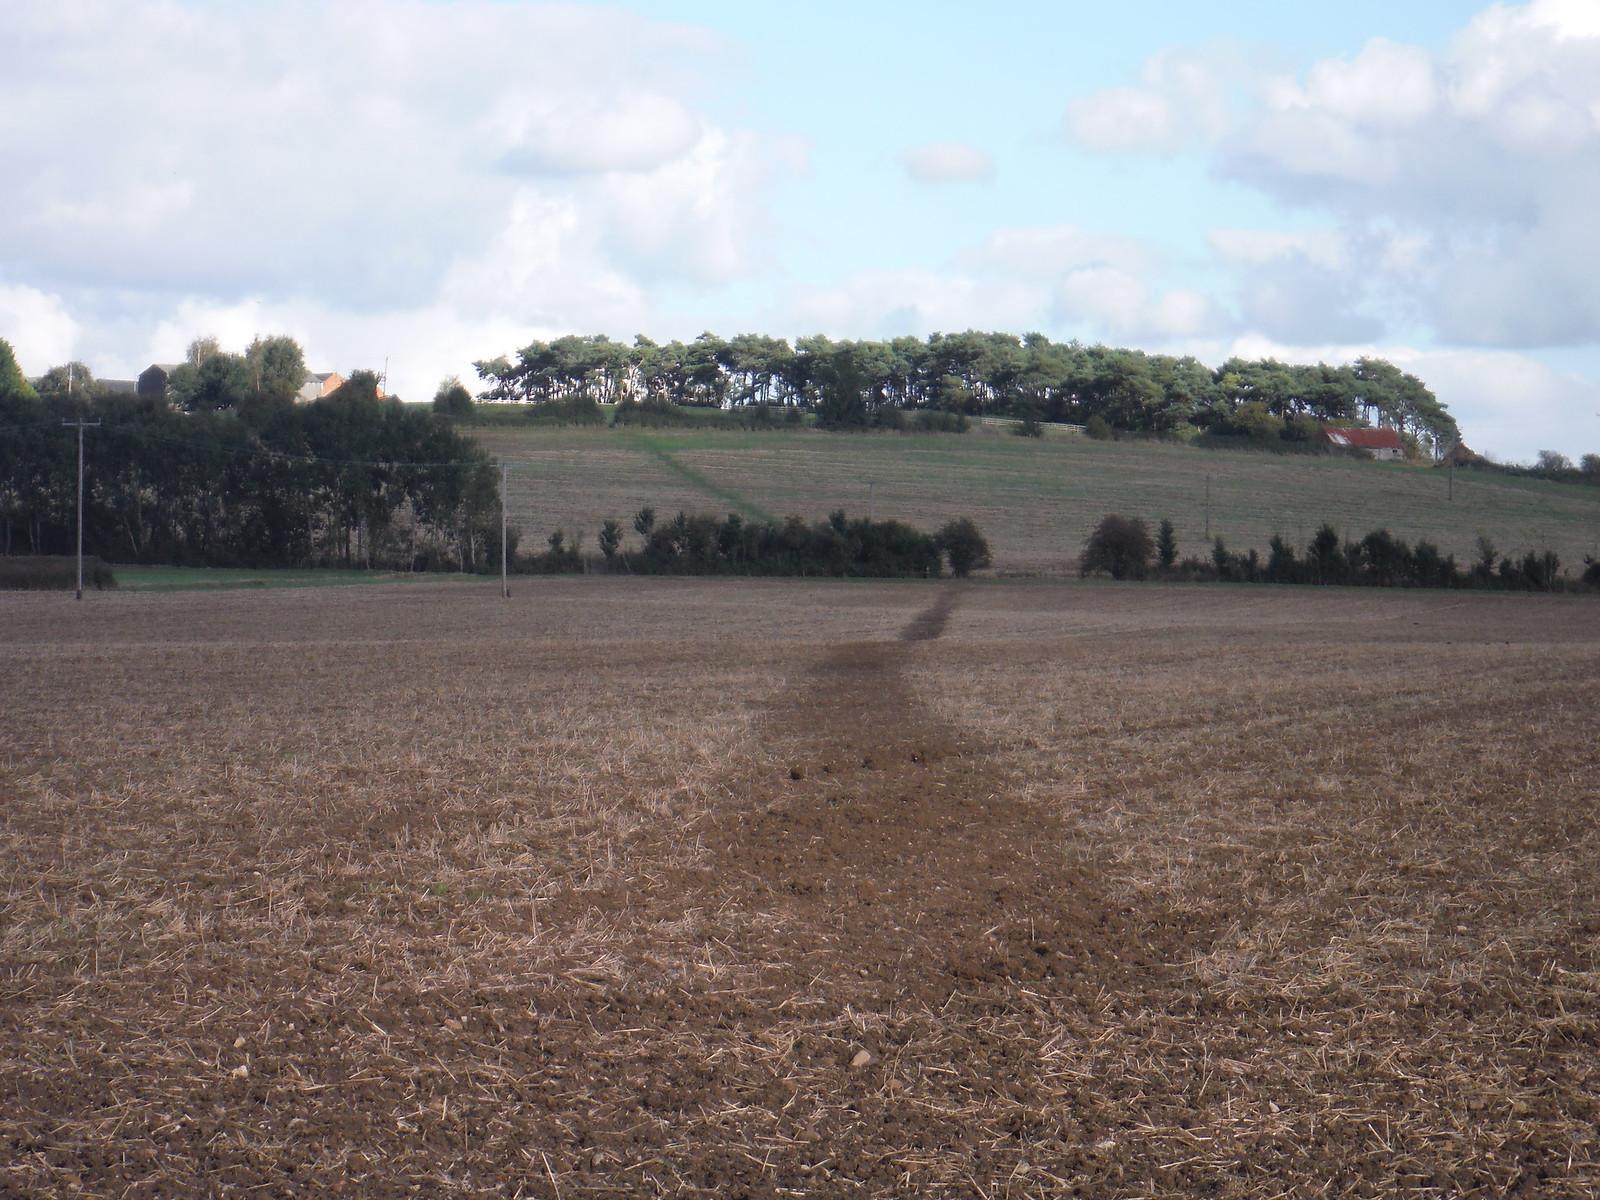 Crossing arable fields up to Aston Abbotts SWC Walk 194 Aylesbury Vale Parkway to Aylesbury